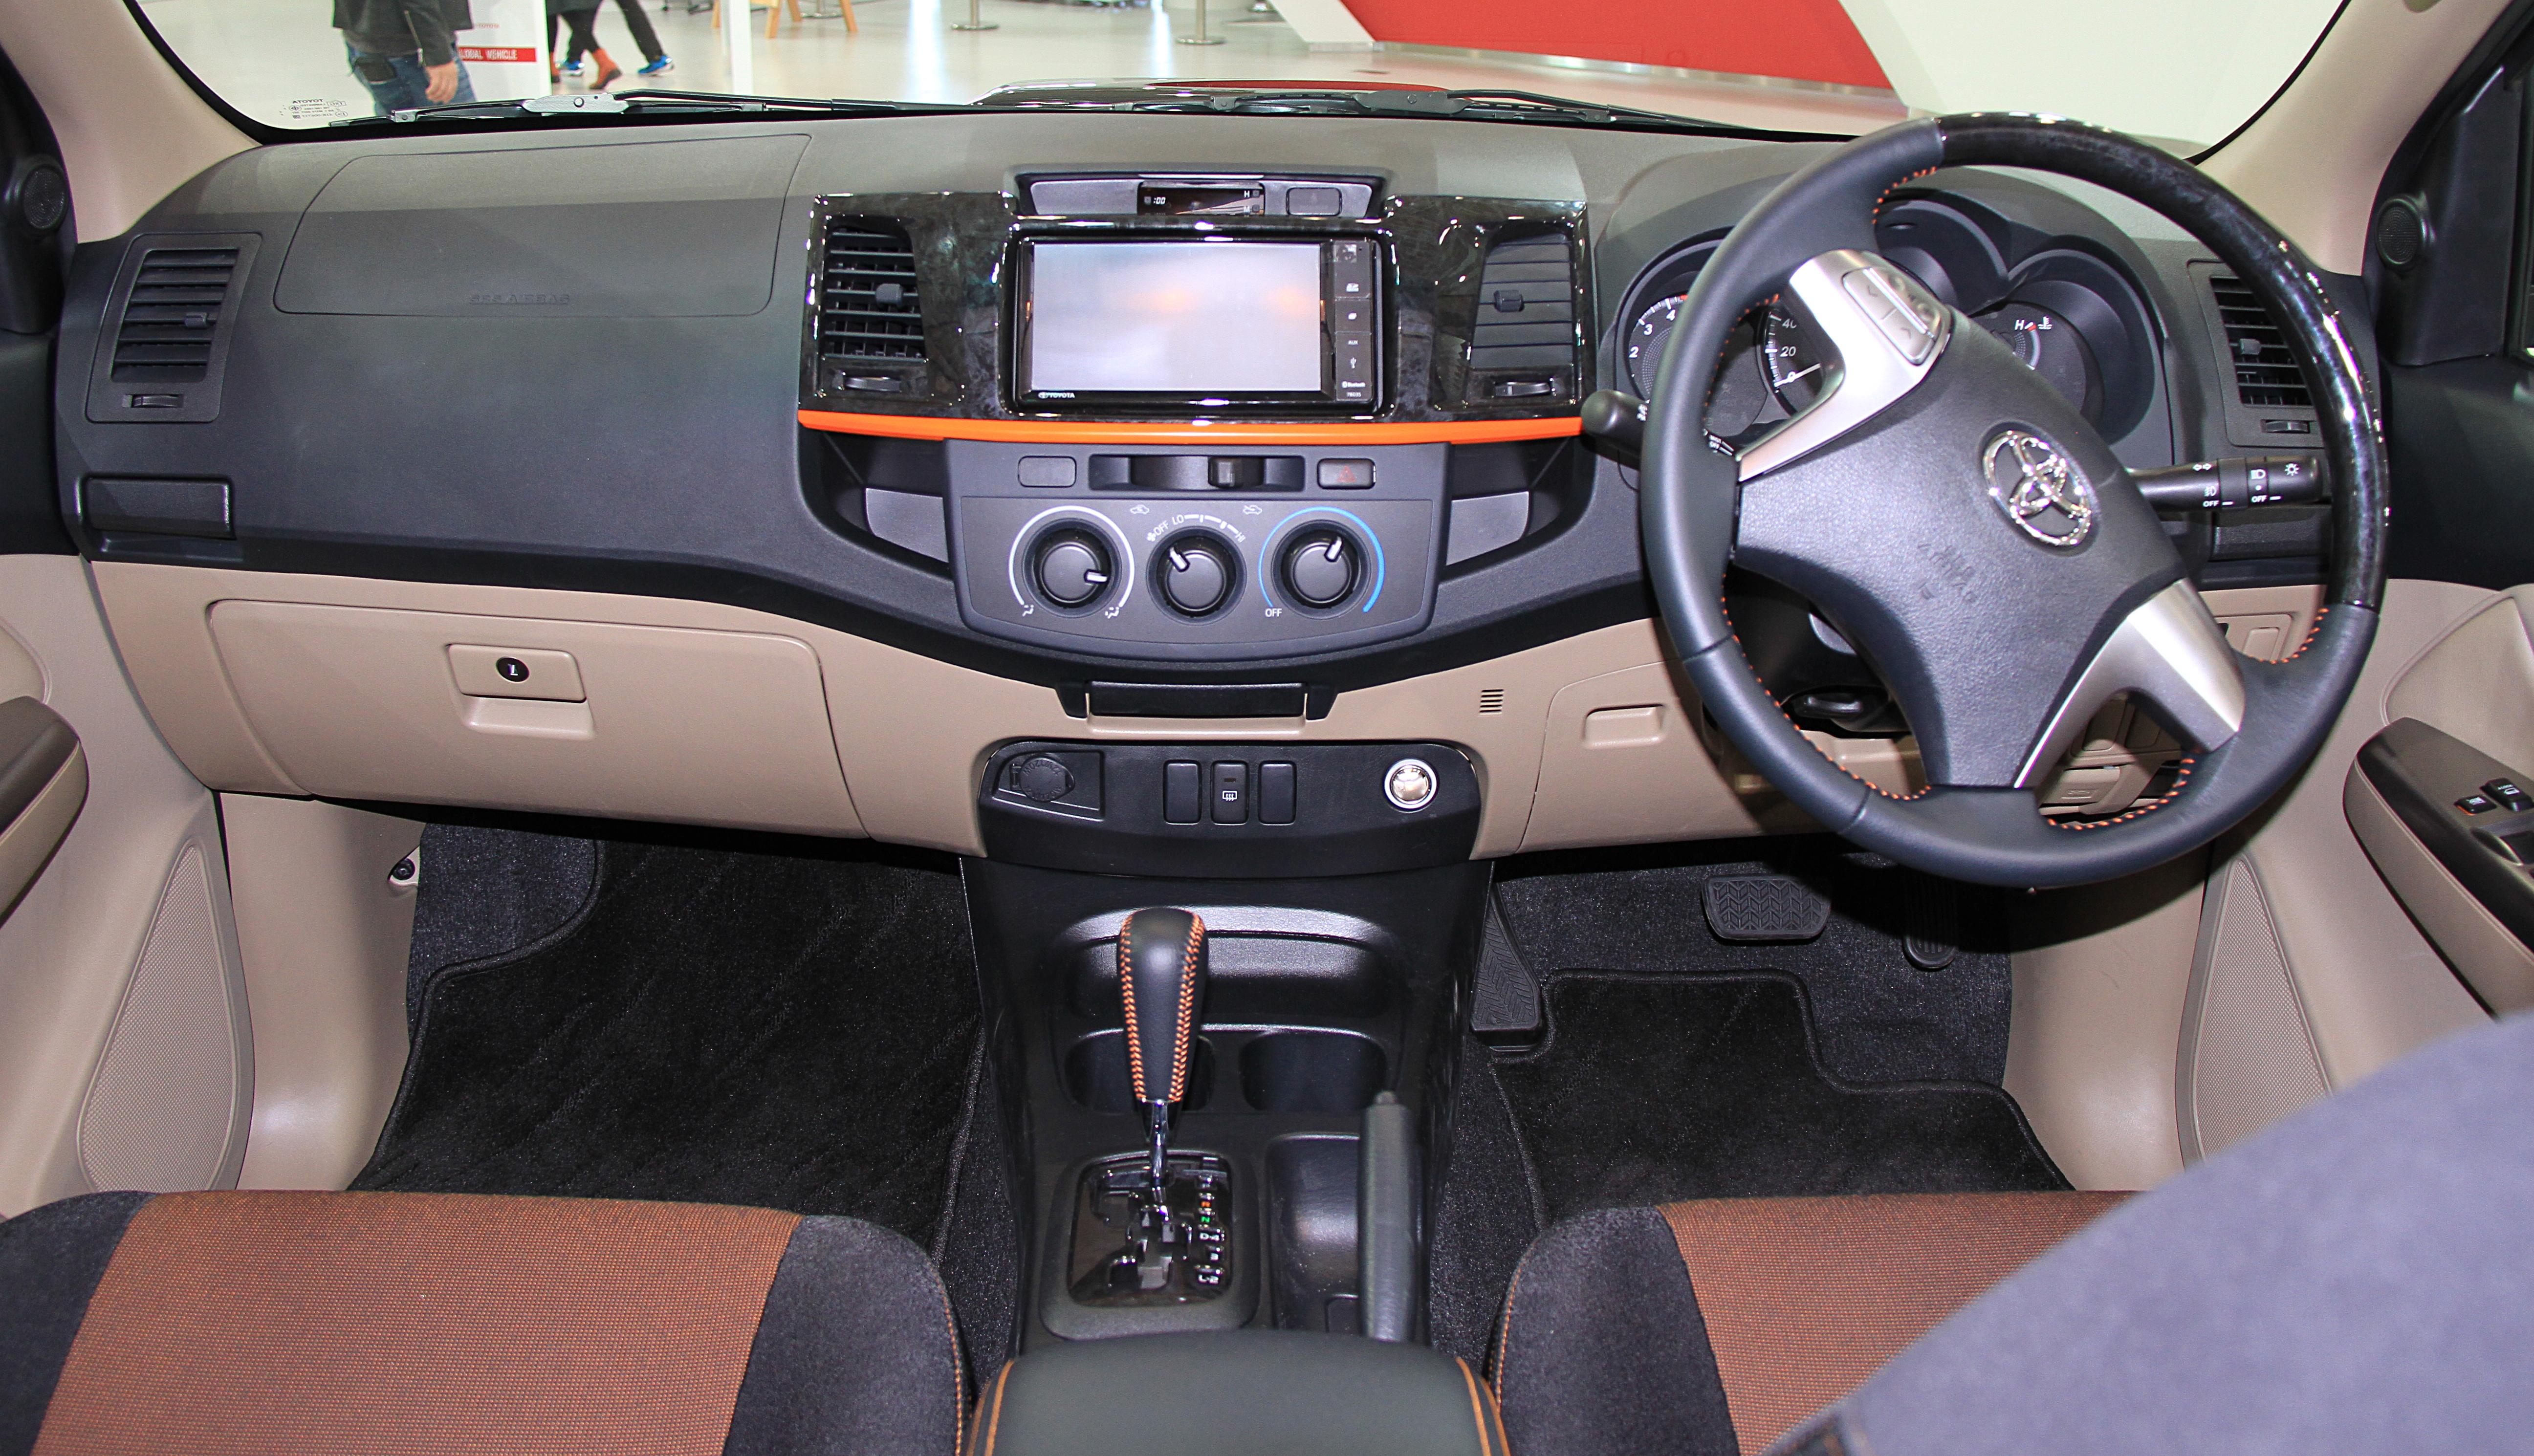 File:Toyota Hilux Vigo Champ TRD interior.jpg - Wikimedia Commons